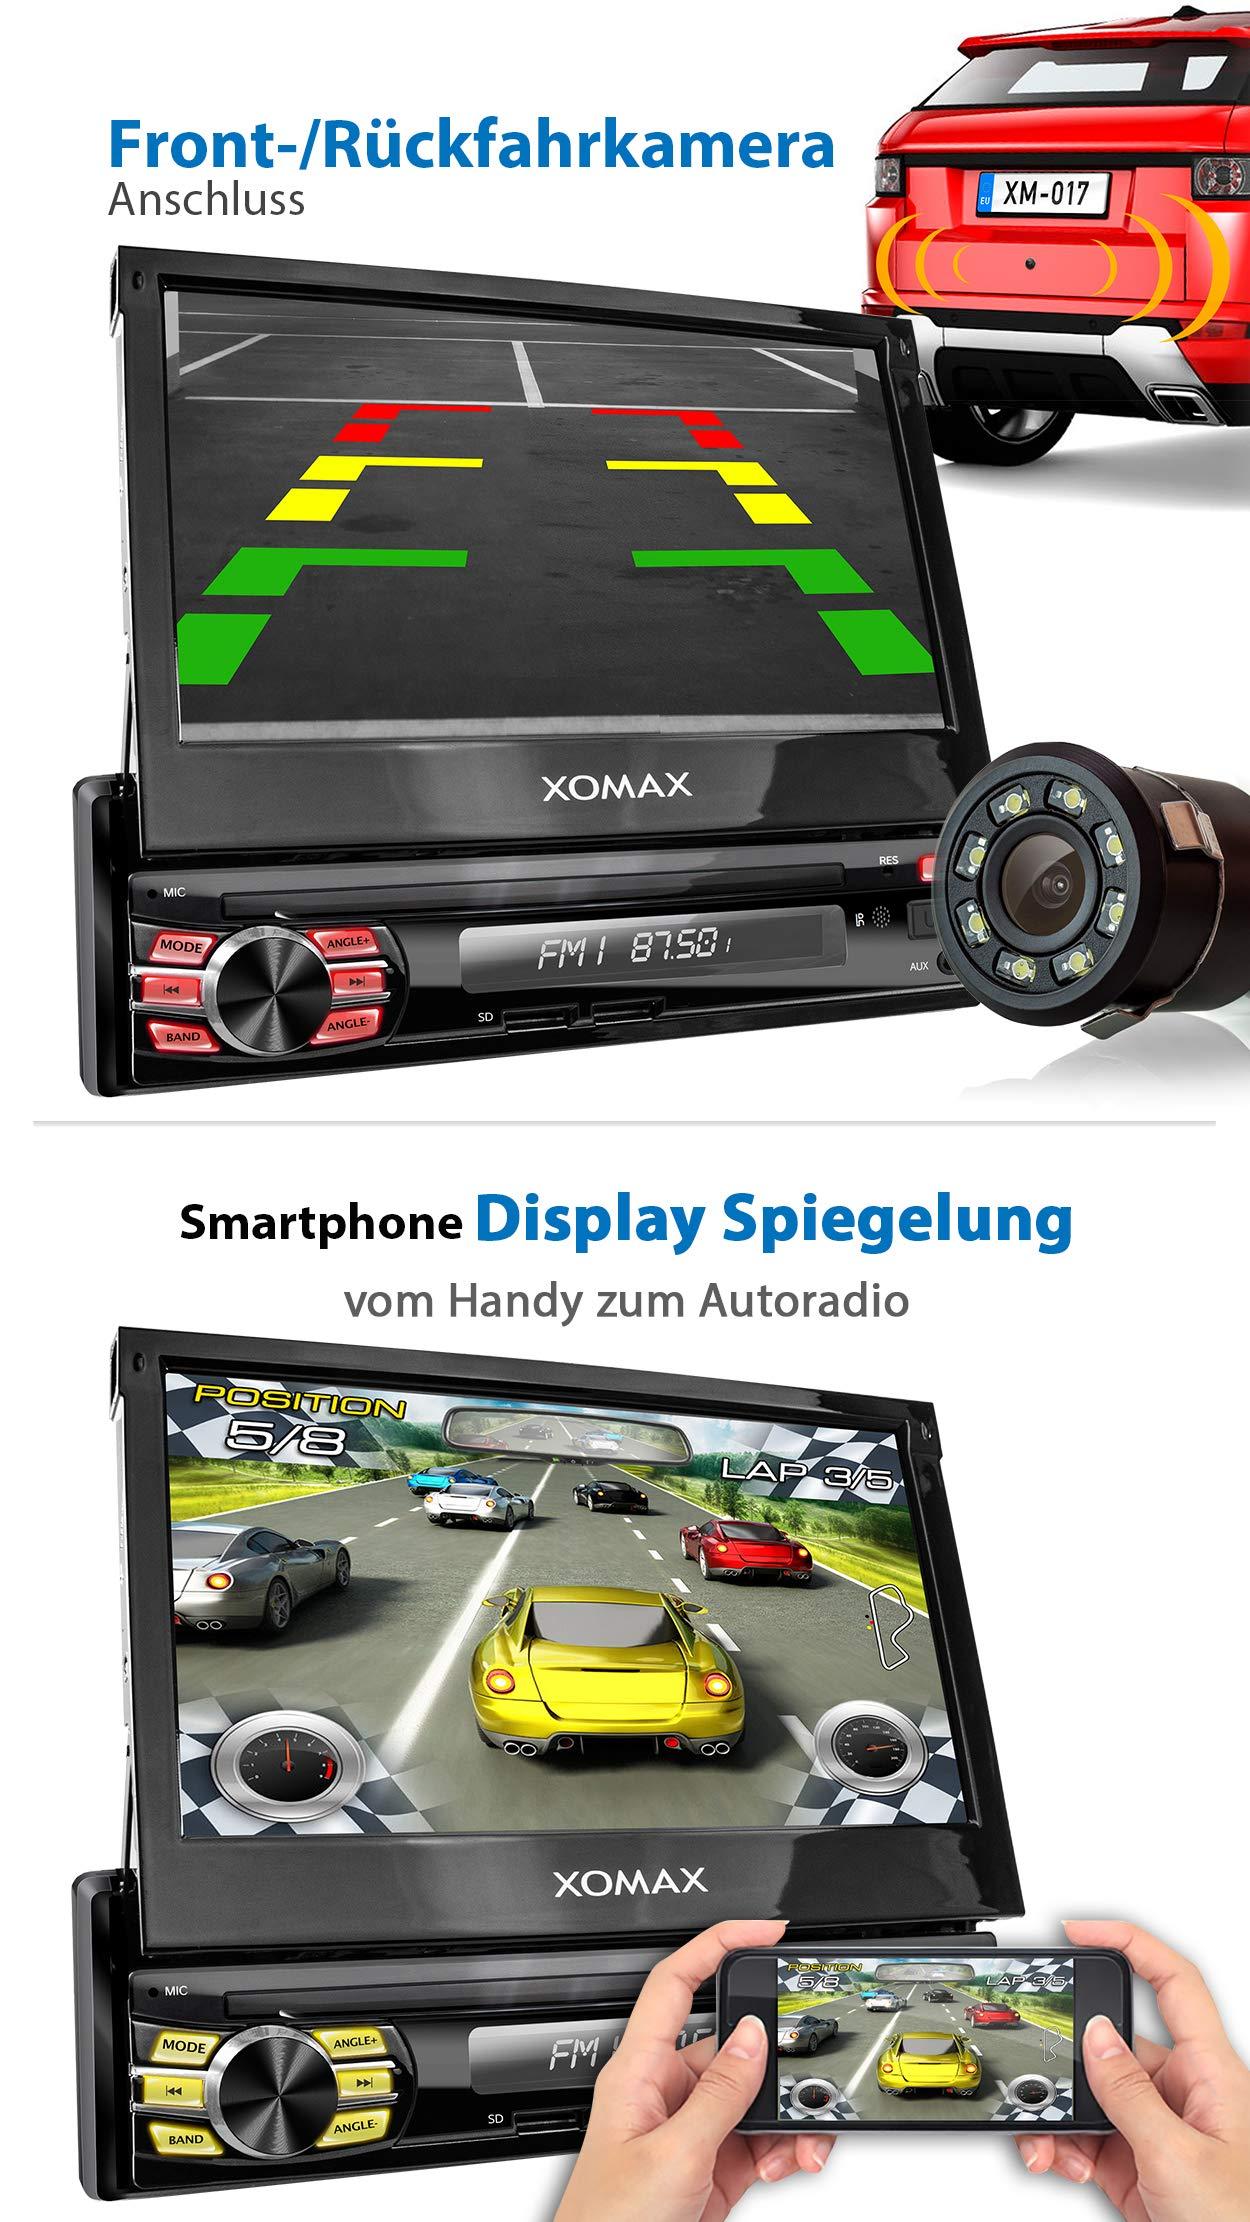 XOMAX-XM-VA707-Autoradio-mit-Android-81-QuadCore-2GB-RAM-16GB-ROM-GPS-Navigation-I-Support-WiFi-WLAN-3G-4G-DAB-OBD2-I-Bluetooth-7-Zoll-18-cm-Touchscreen-USB-SD-AUX-1-DIN